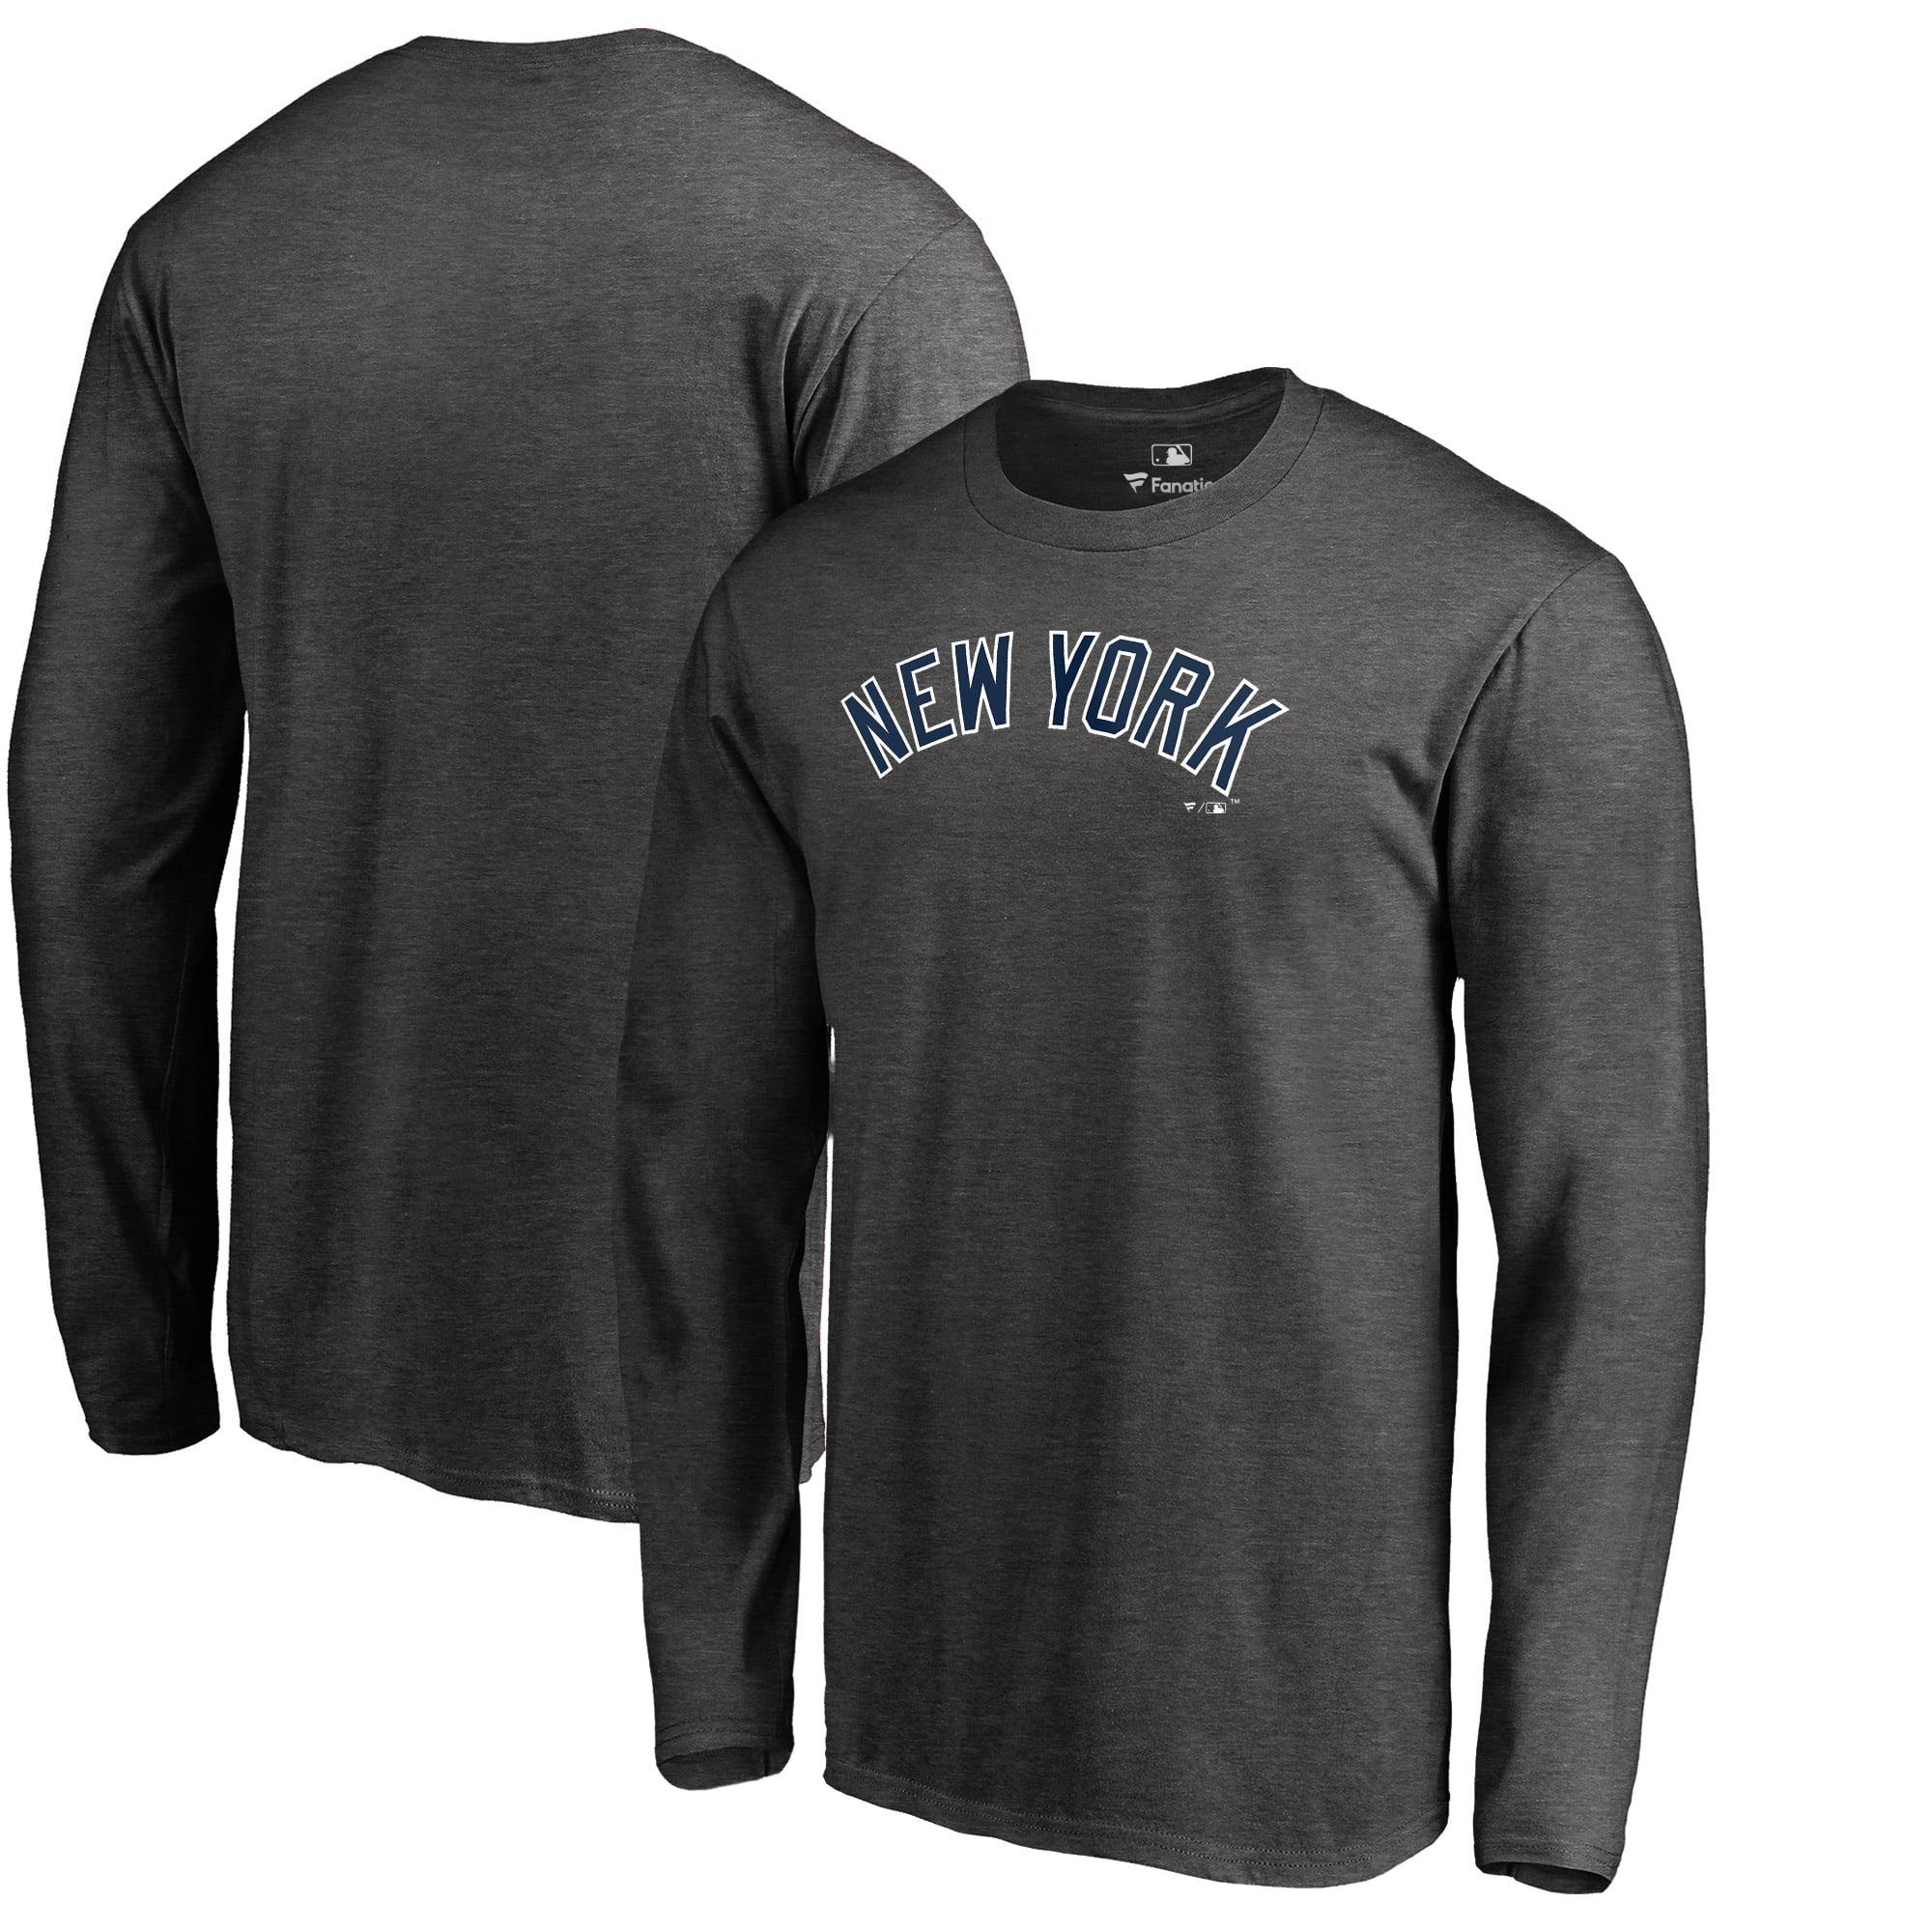 New York Yankees Fanatics Branded Team Wordmark Long Sleeve T-Shirt - Heathered Charcoal